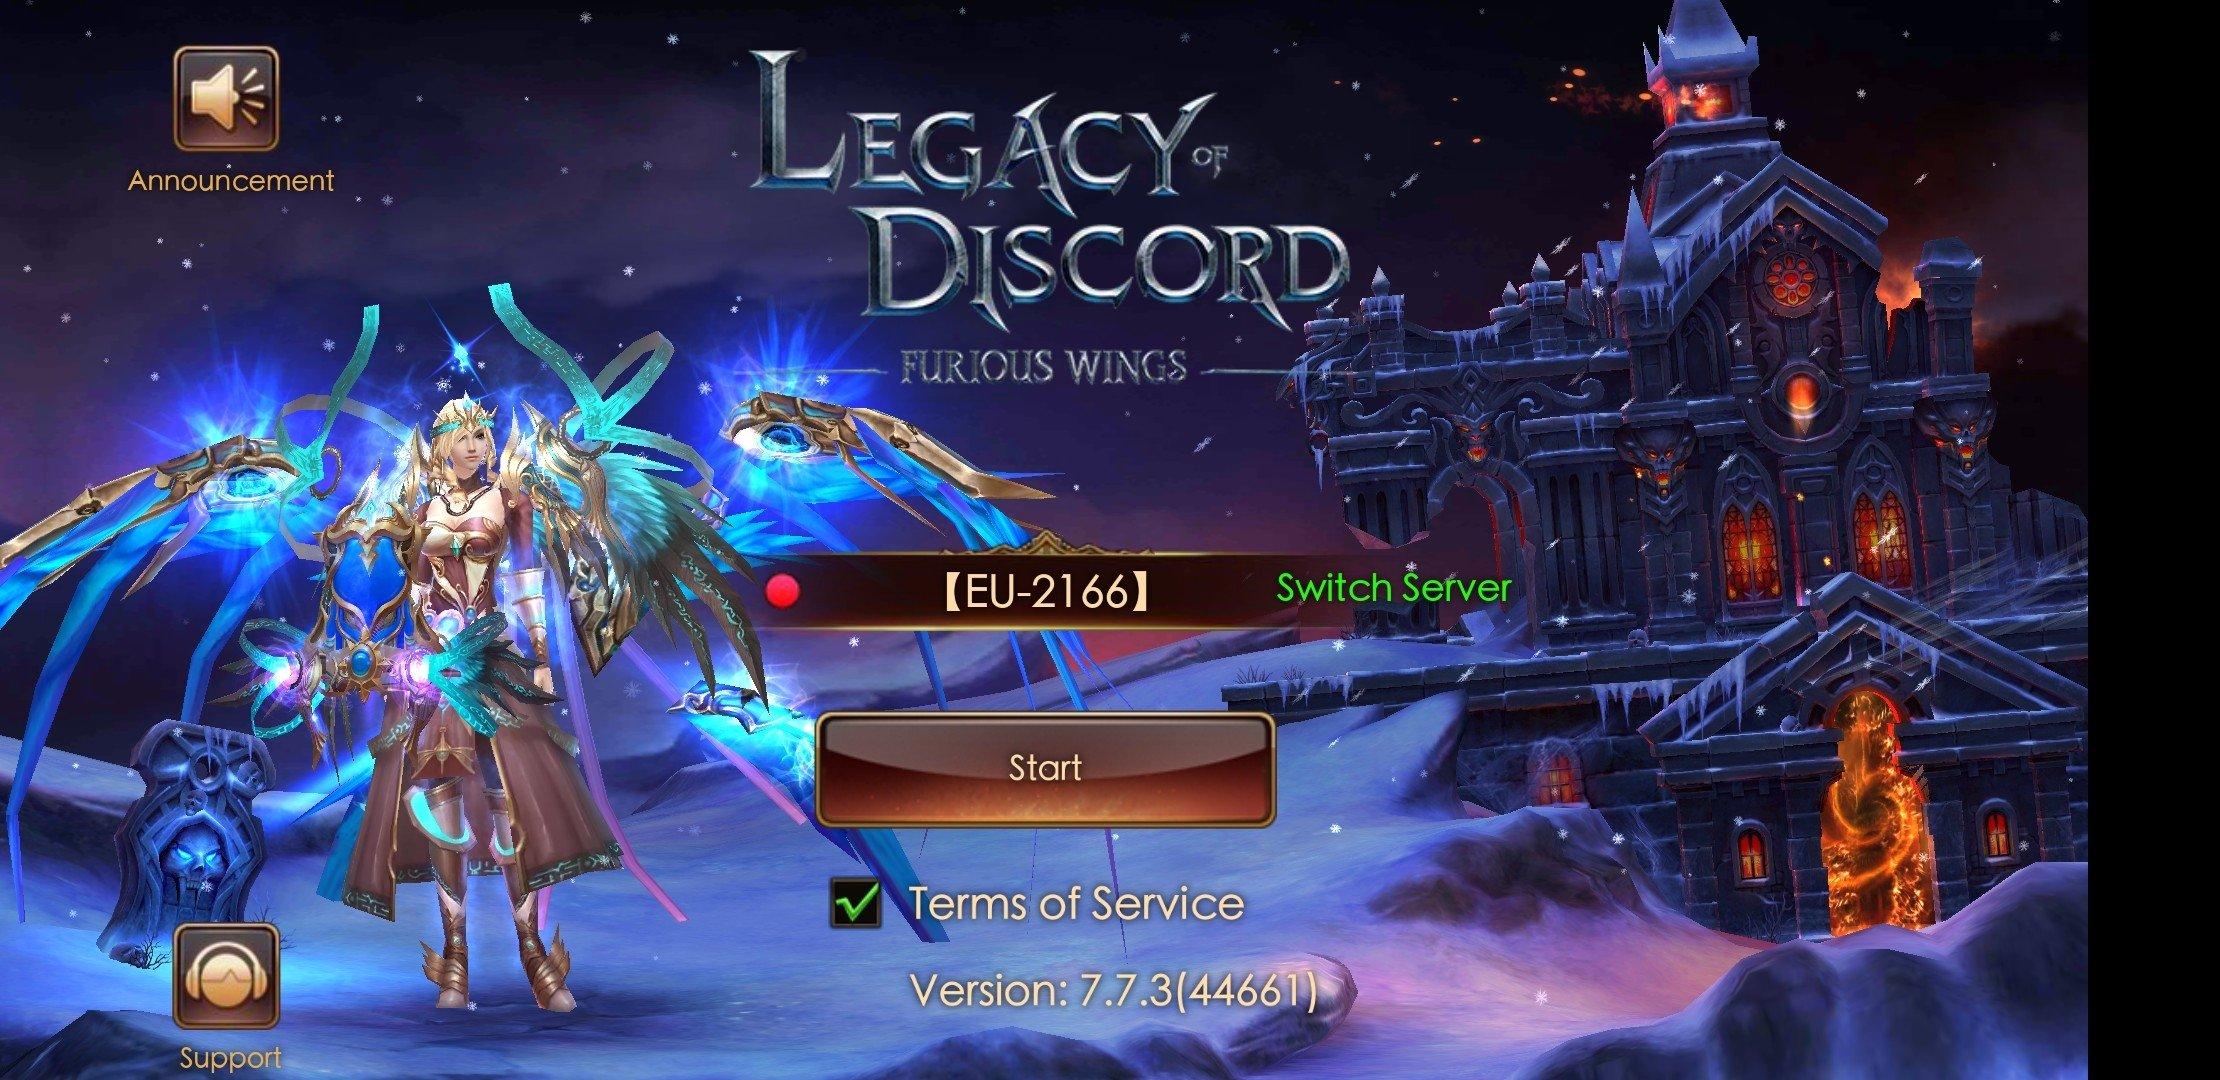 download discord apk